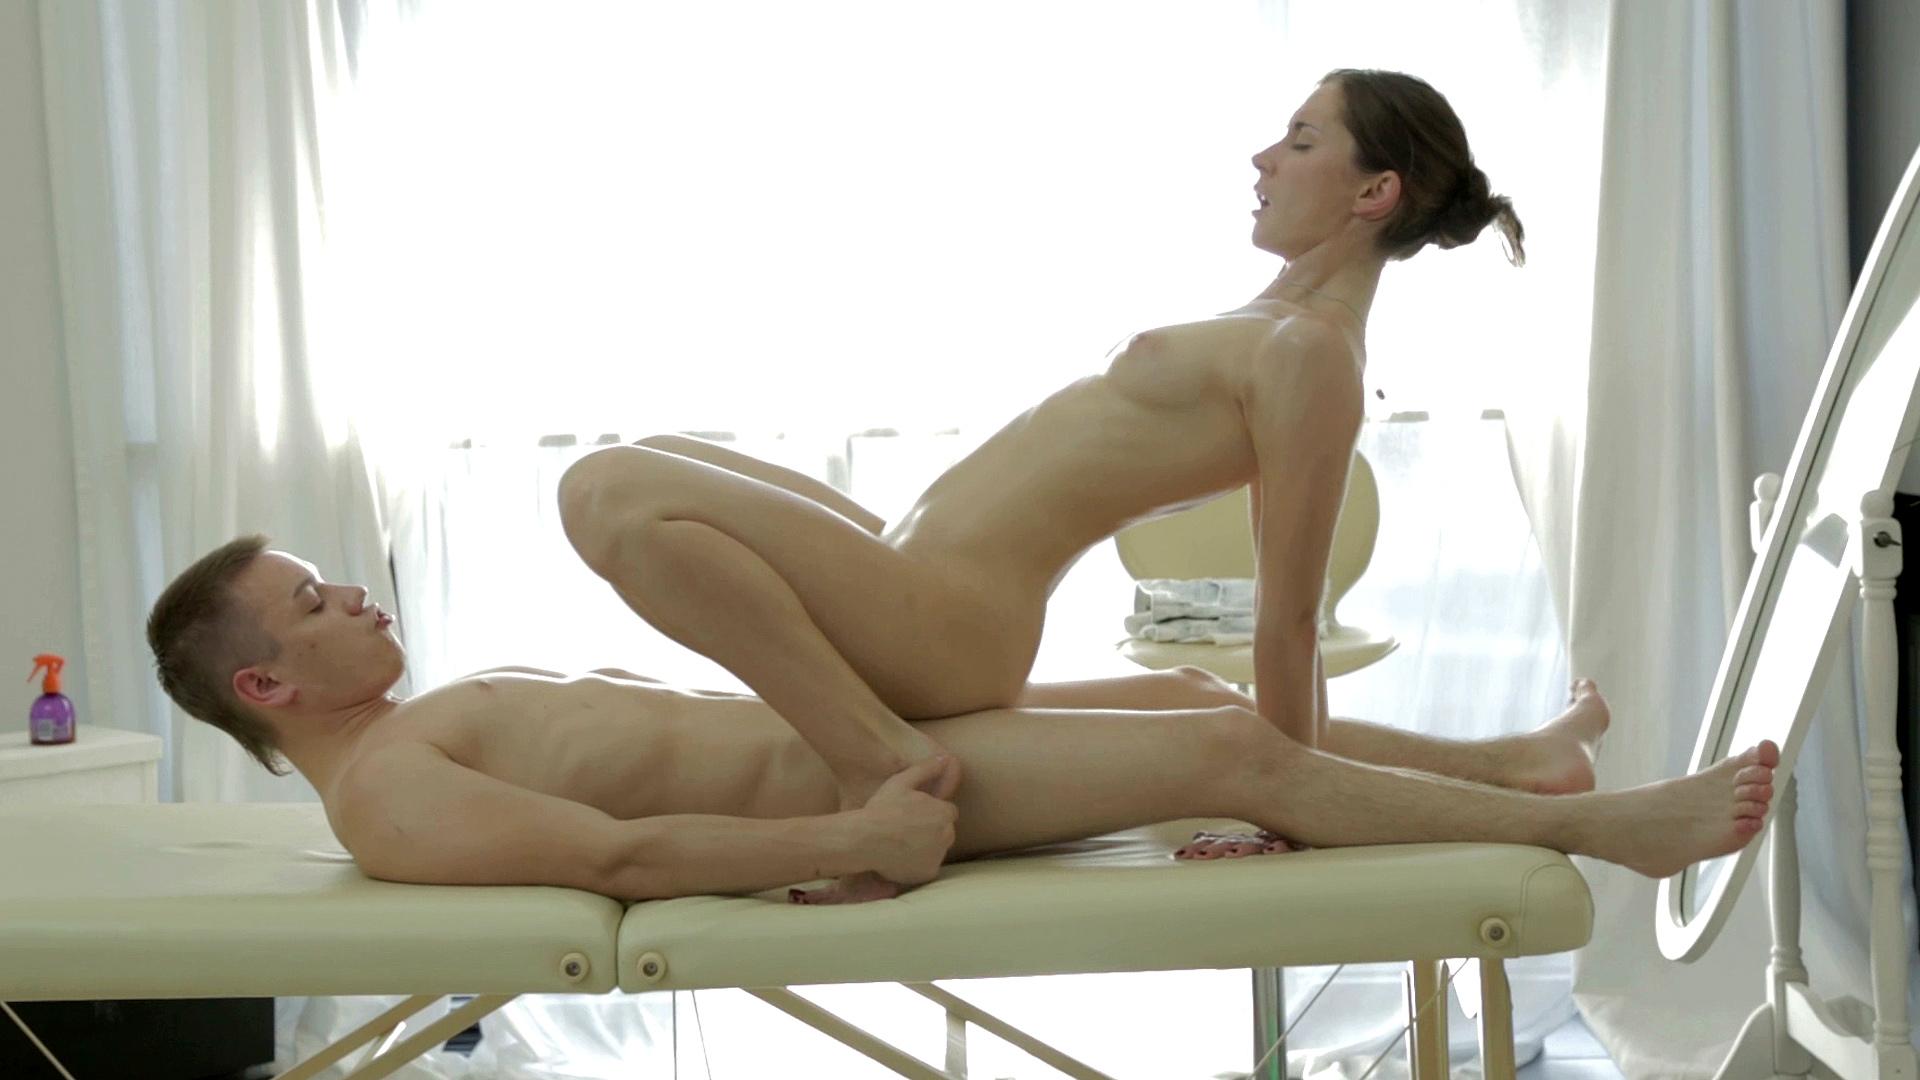 Massage and anal pleasure - Aruna Aghora